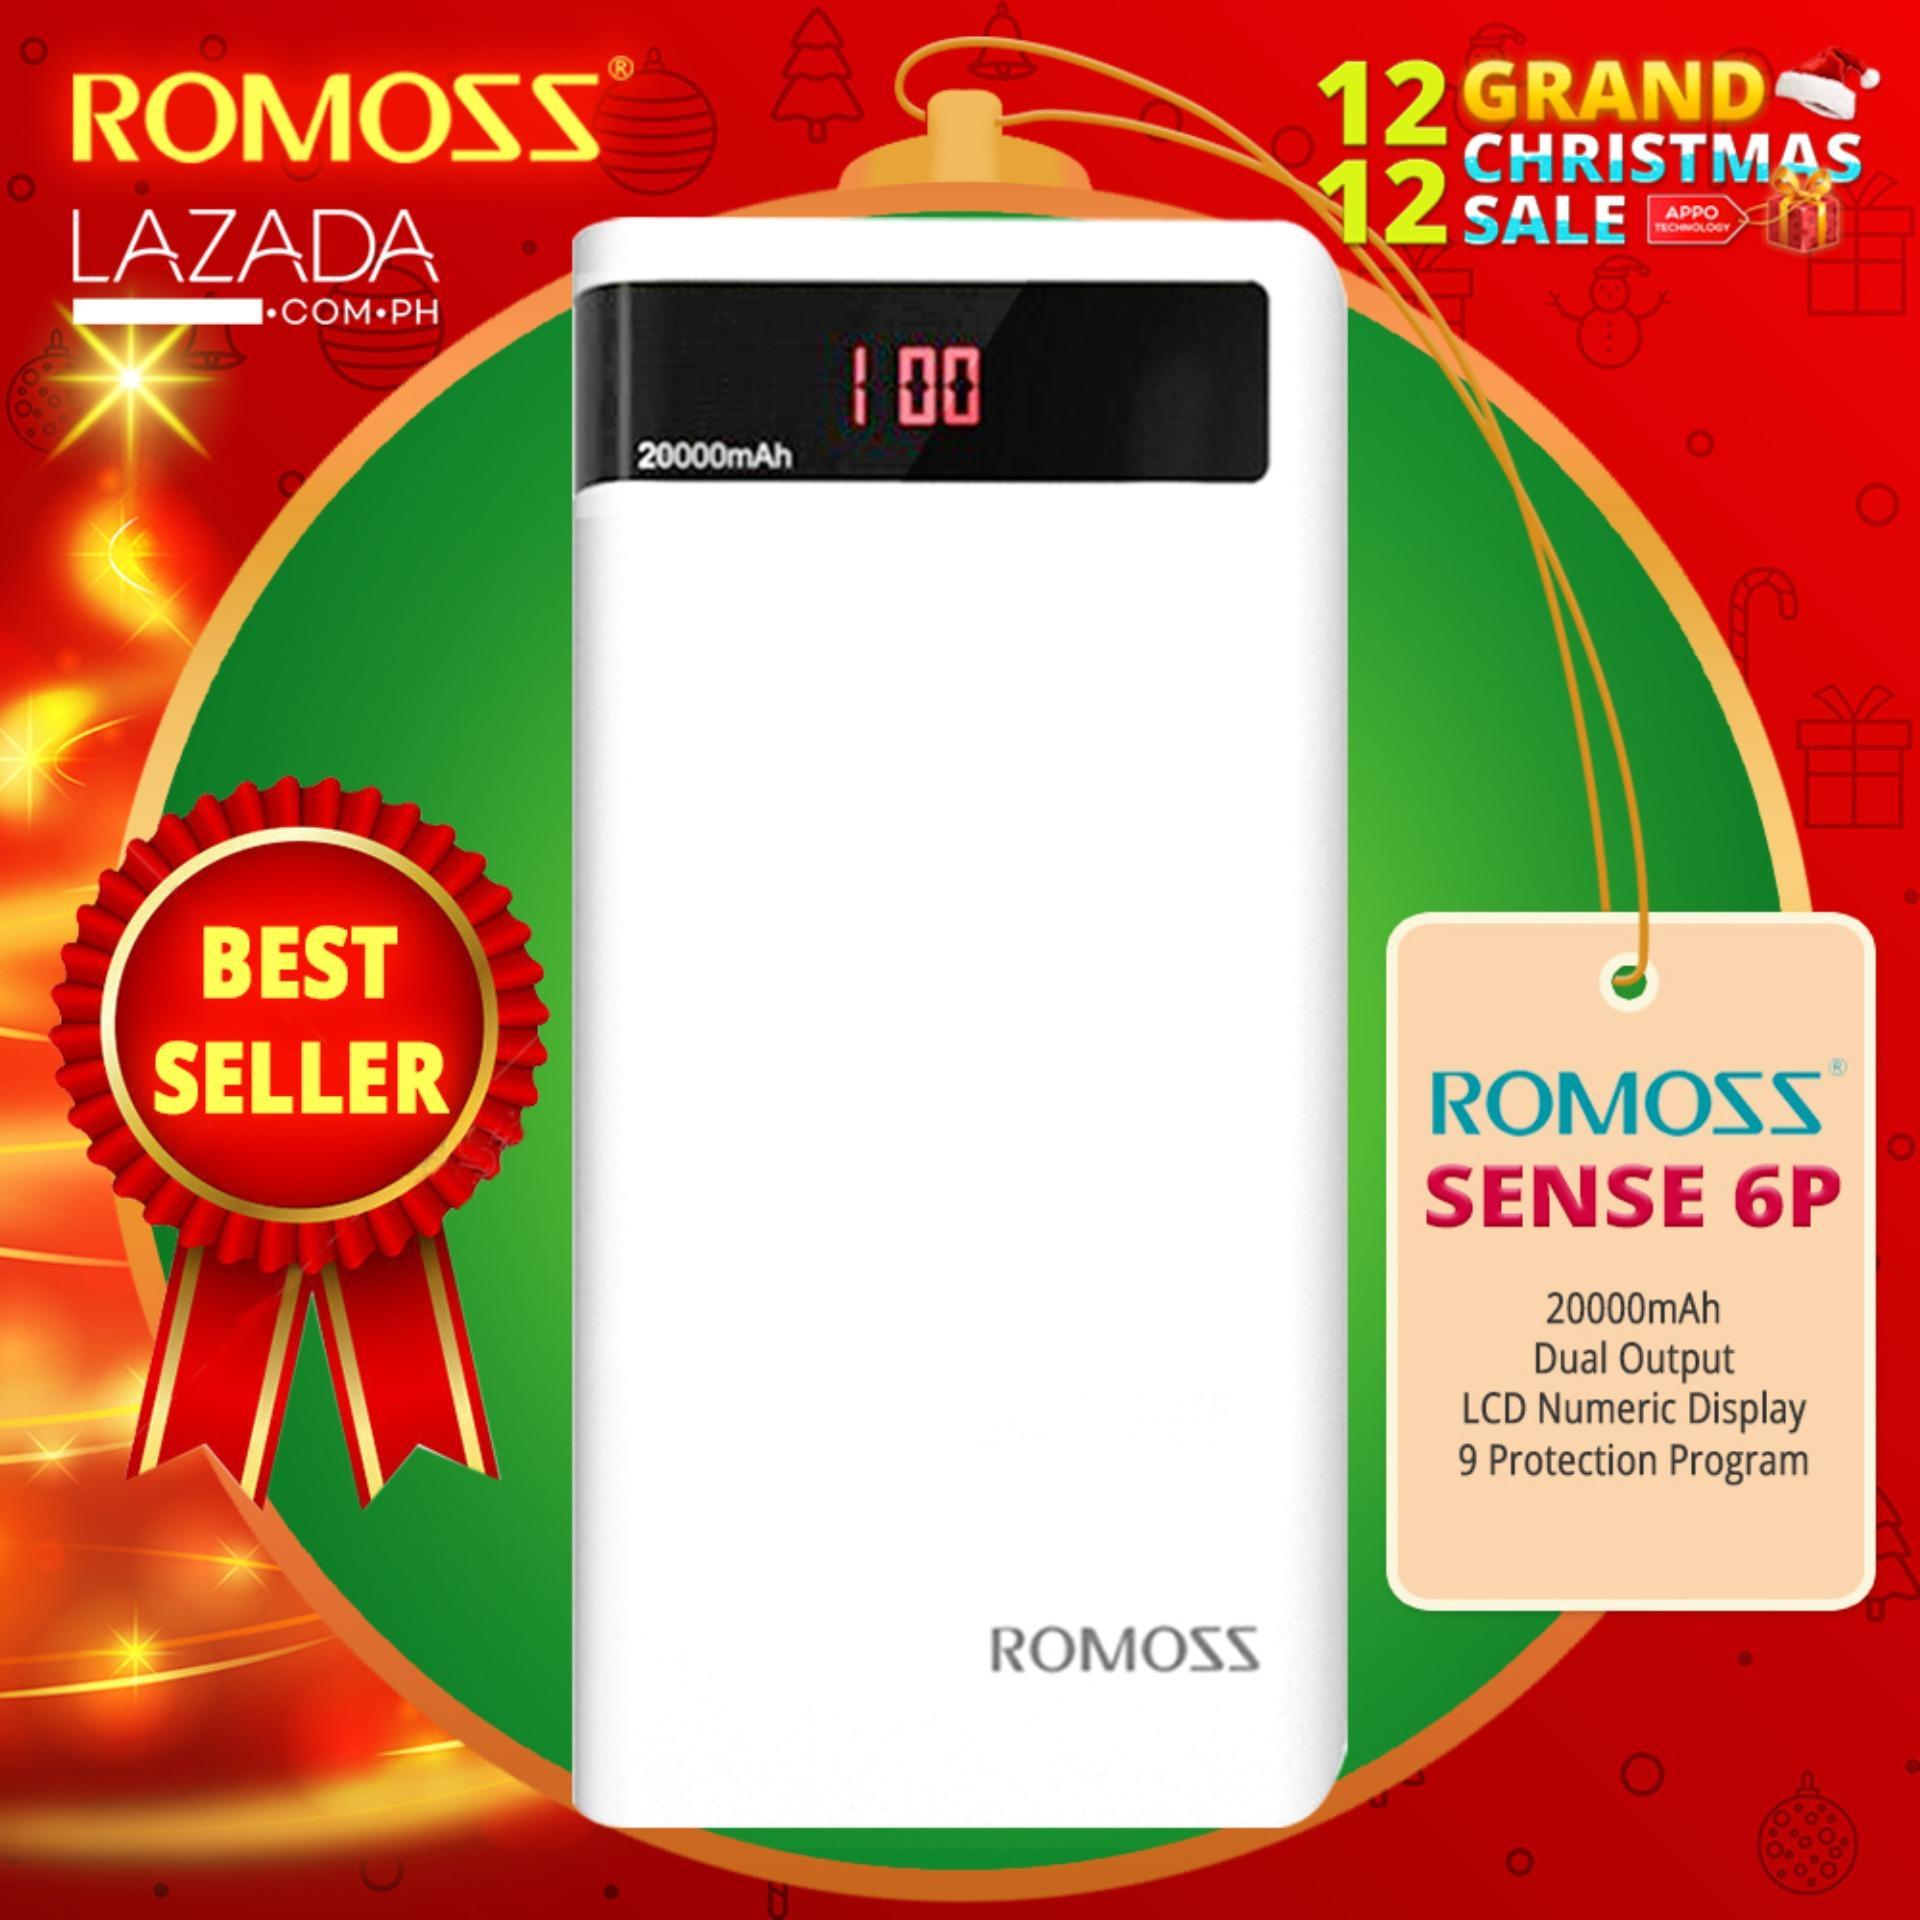 Romoss Philippines Power Bank For Sale Prices Reviews Loop September Powerbank Slim 80000mah Sense 6p 20000mah Dual Output Led Display White